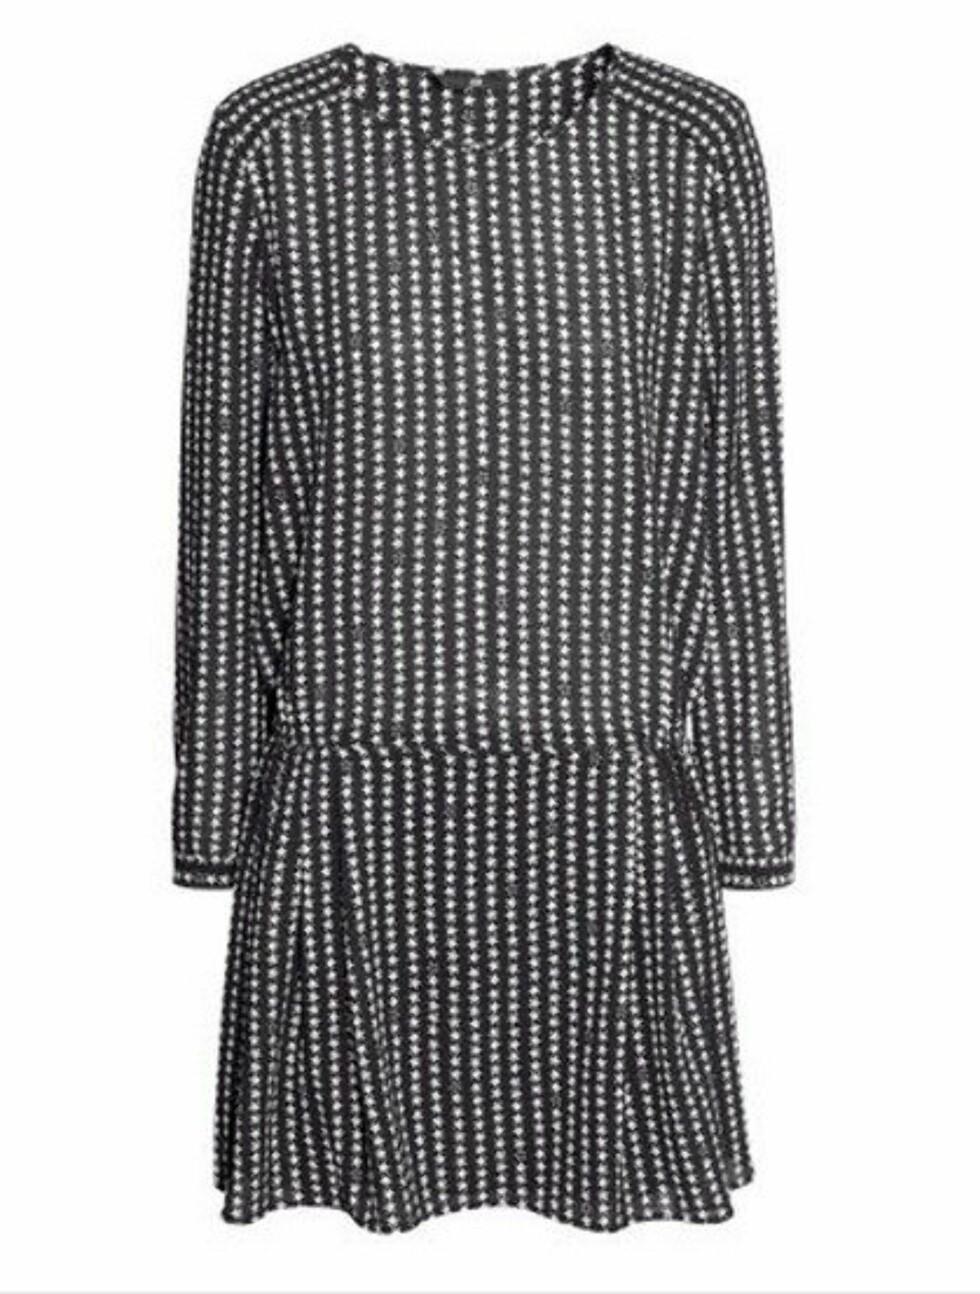 Isabel Marant-inspirert kjole i chiffon. 299 kroner, Hm.com.  Foto: Produsenten